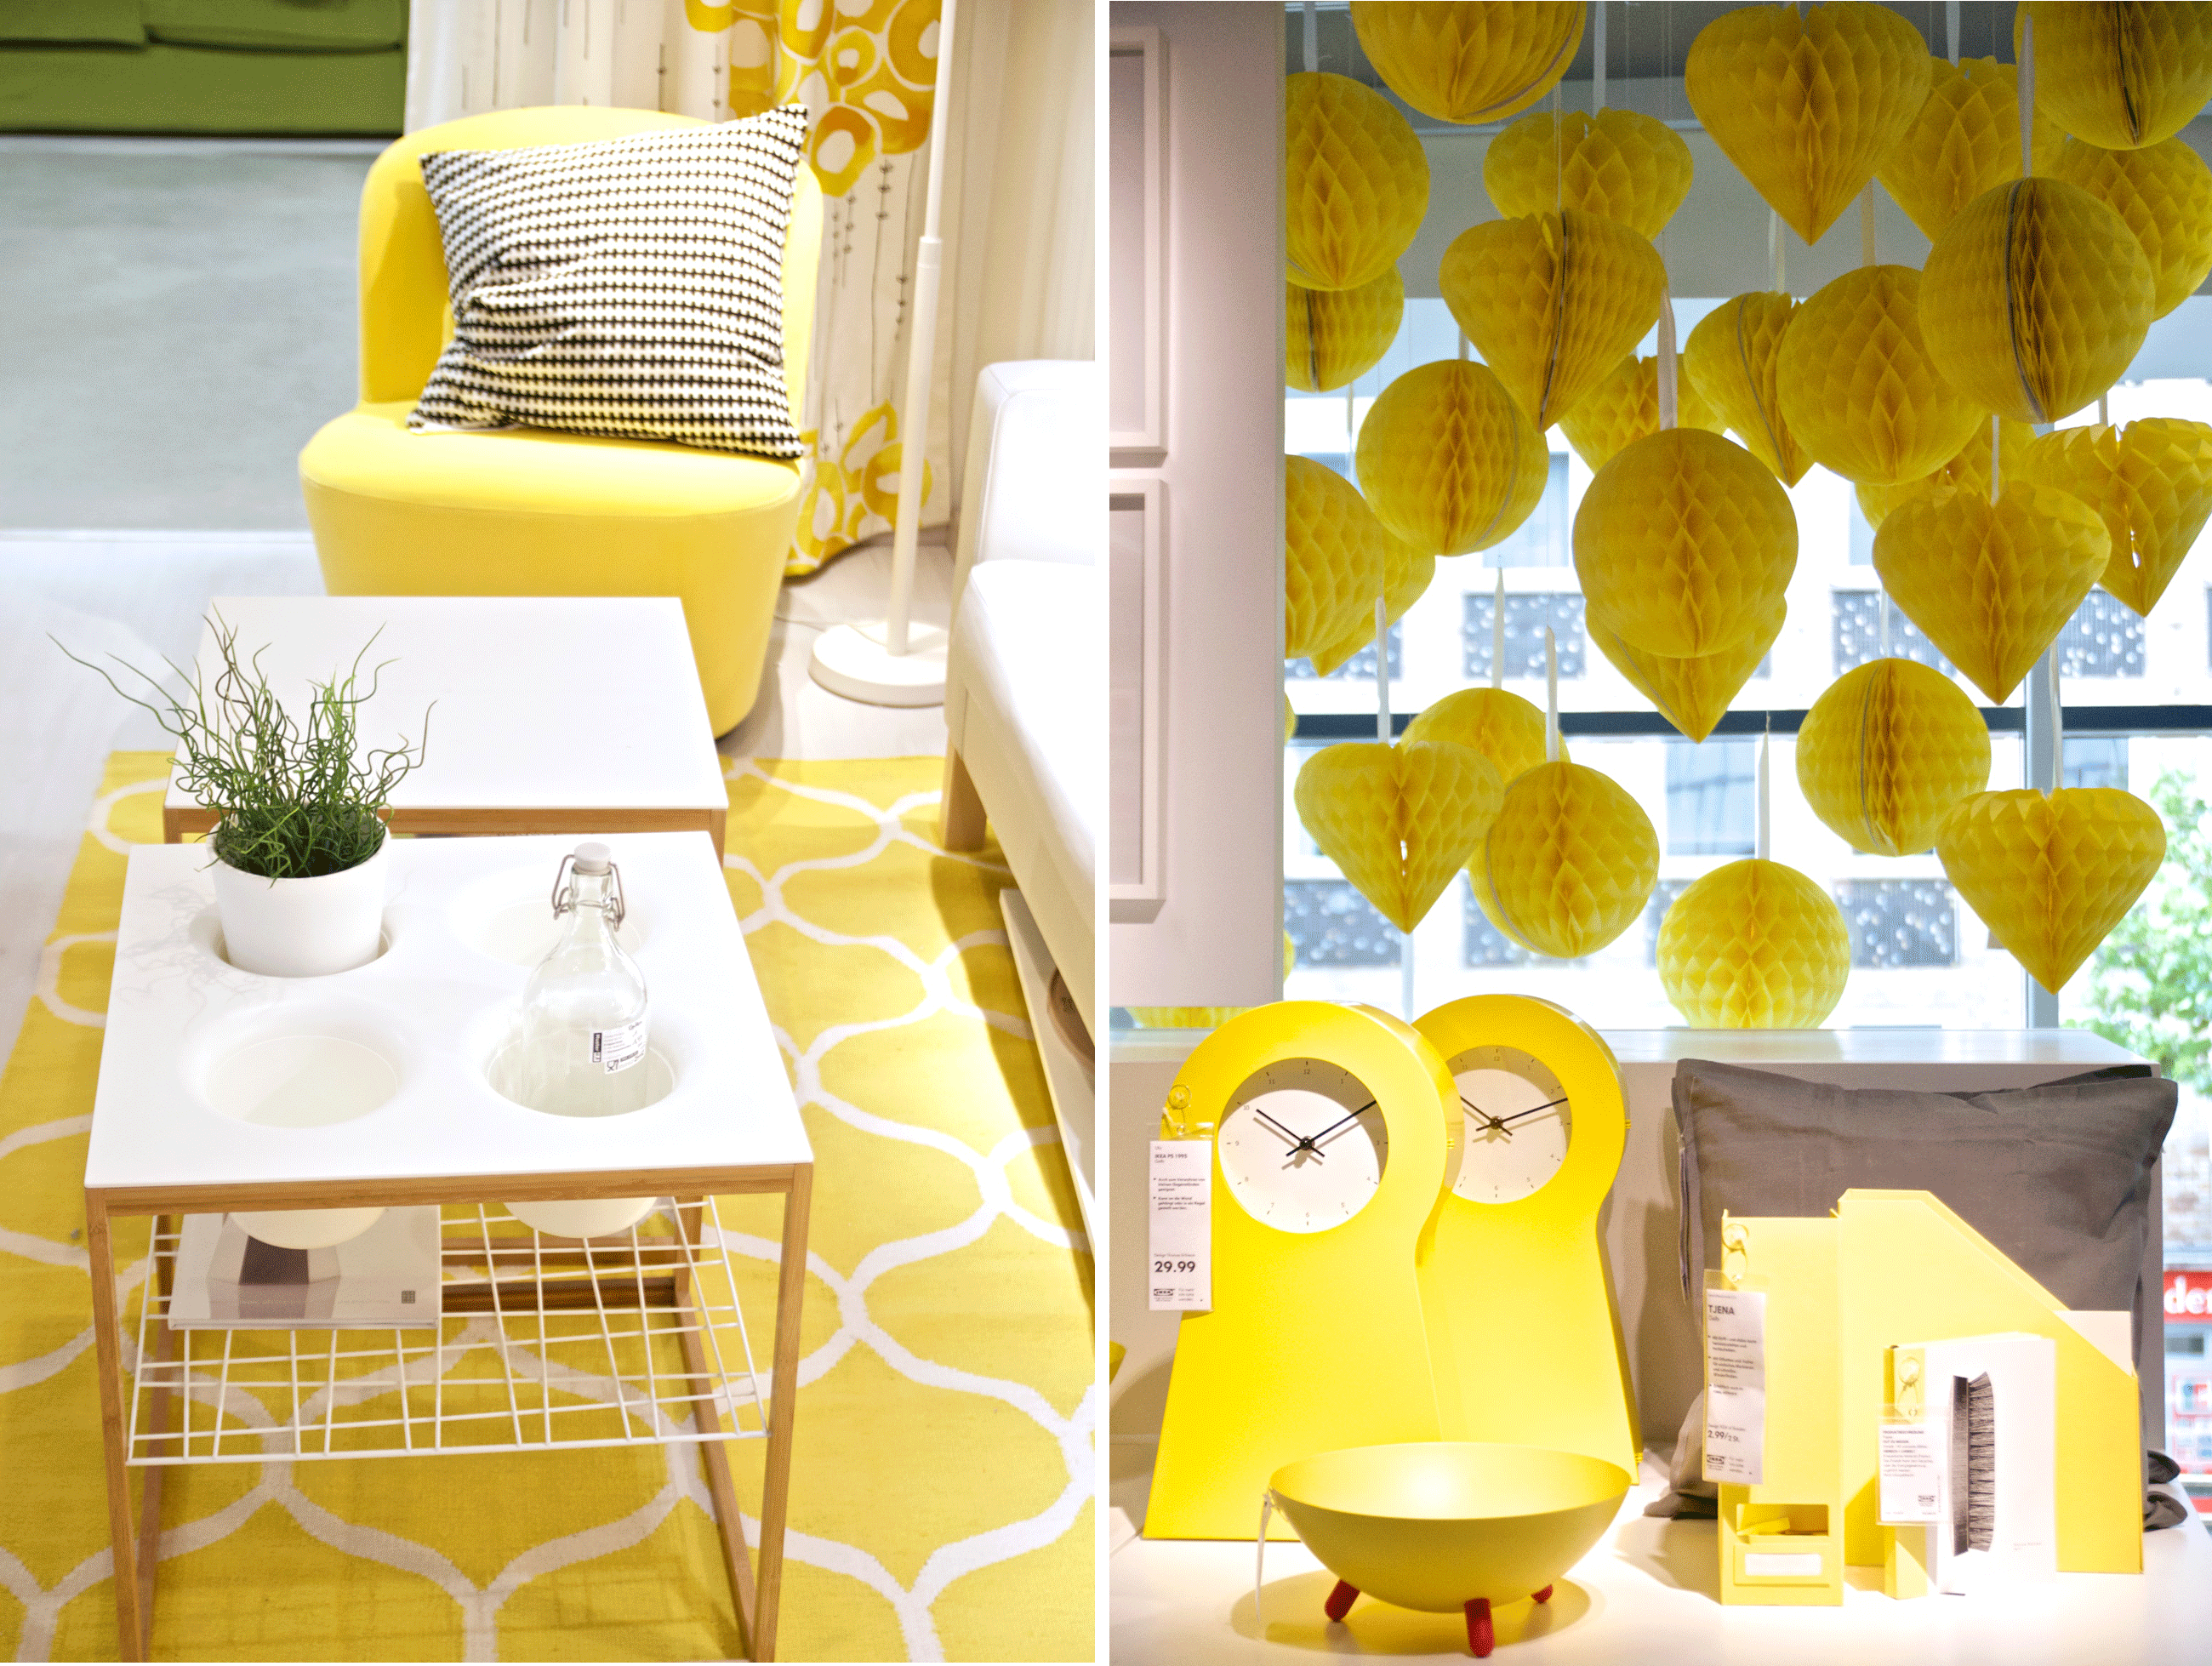 Ikea-Altona-Trendfarbe-Gelb